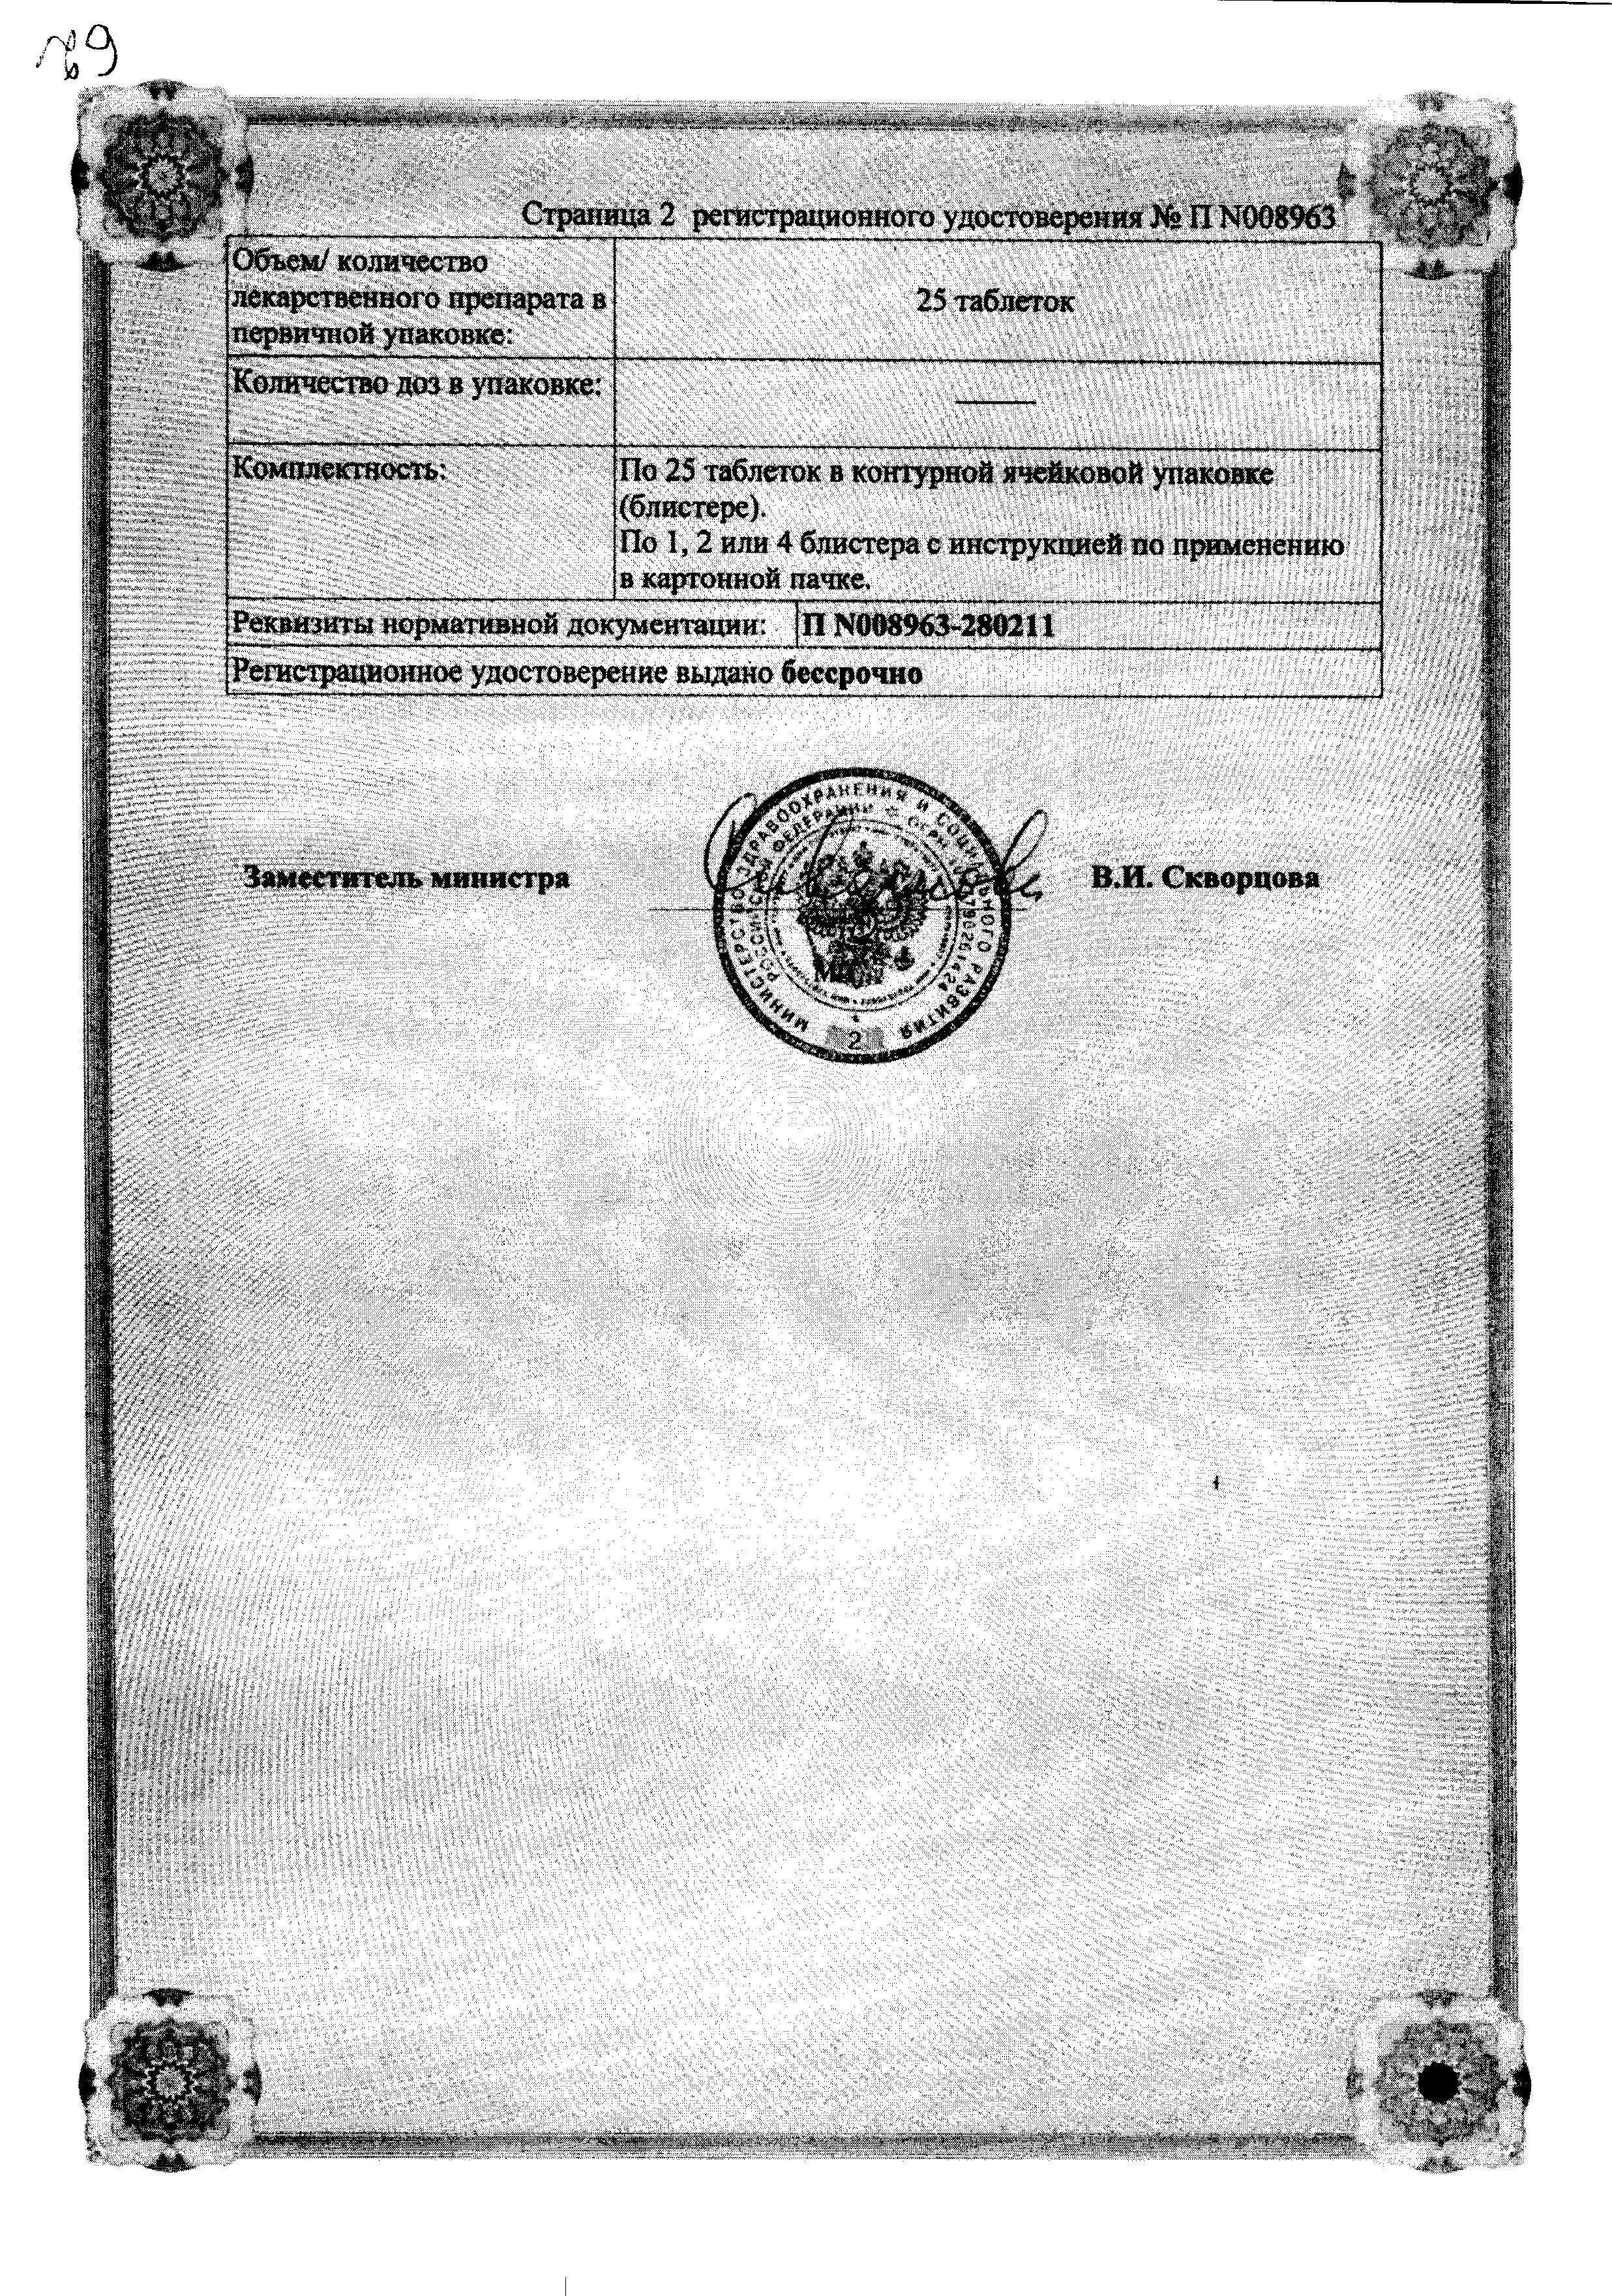 L-Тироксин 50 Берлин-Хеми сертификат